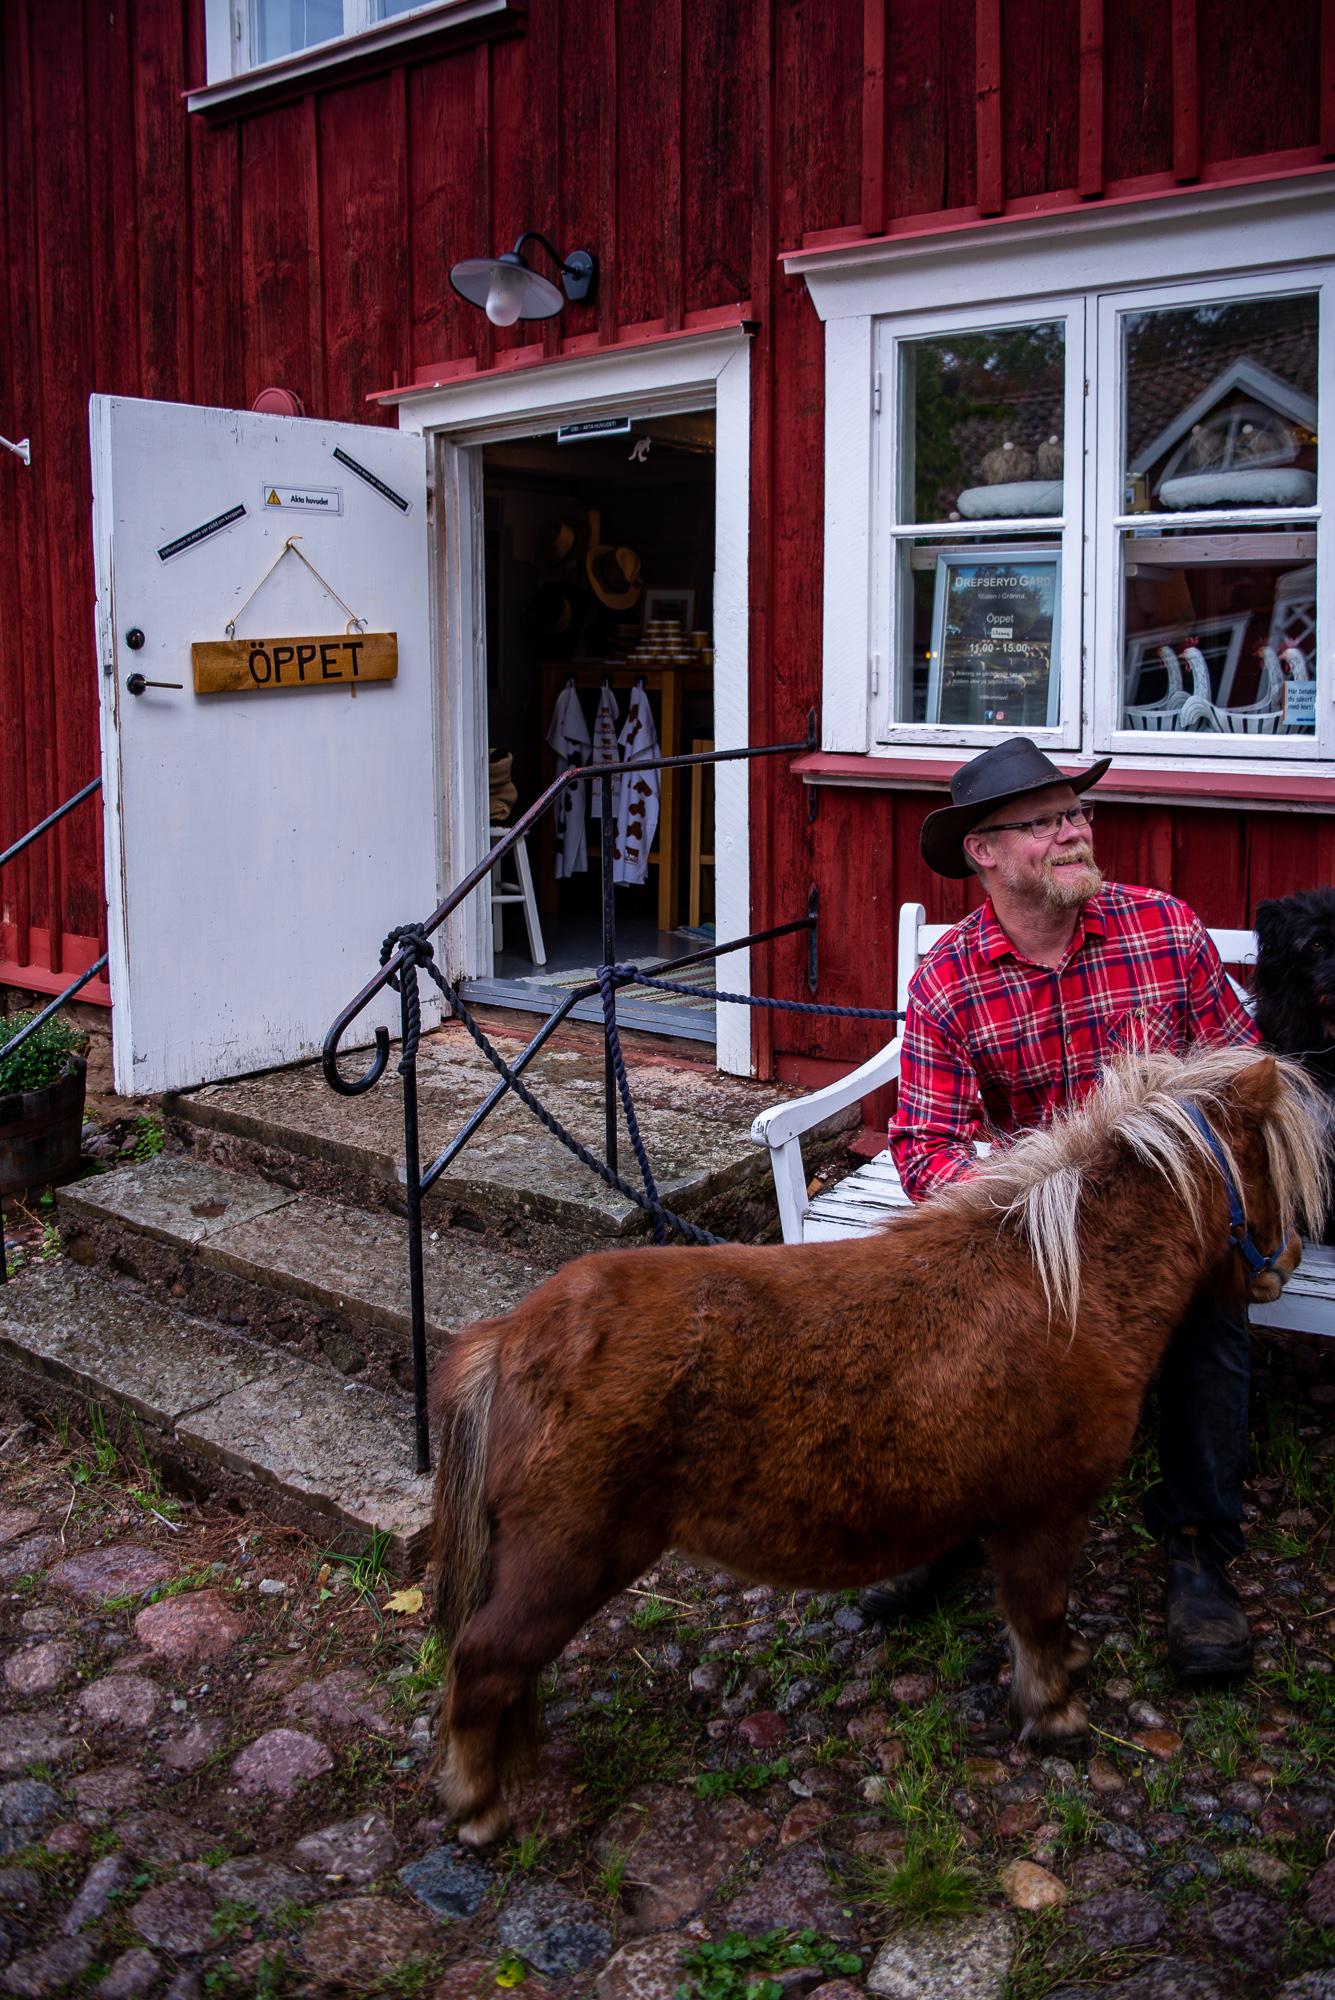 Gränna- meeting the locals